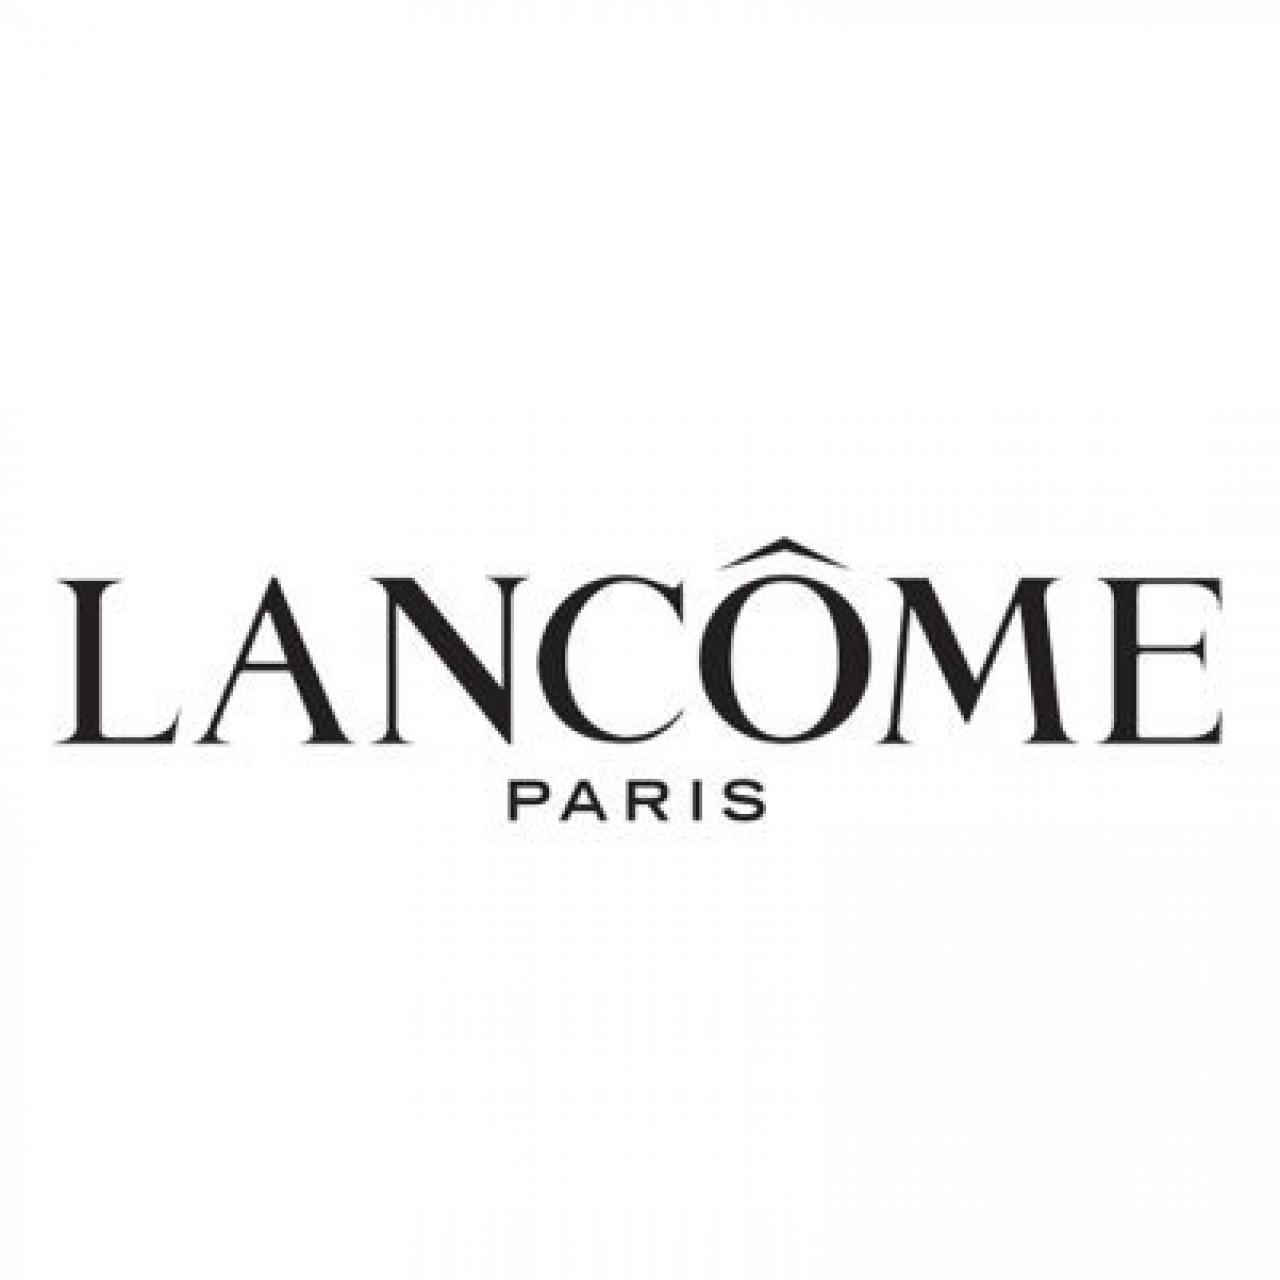 LANCOM 画像